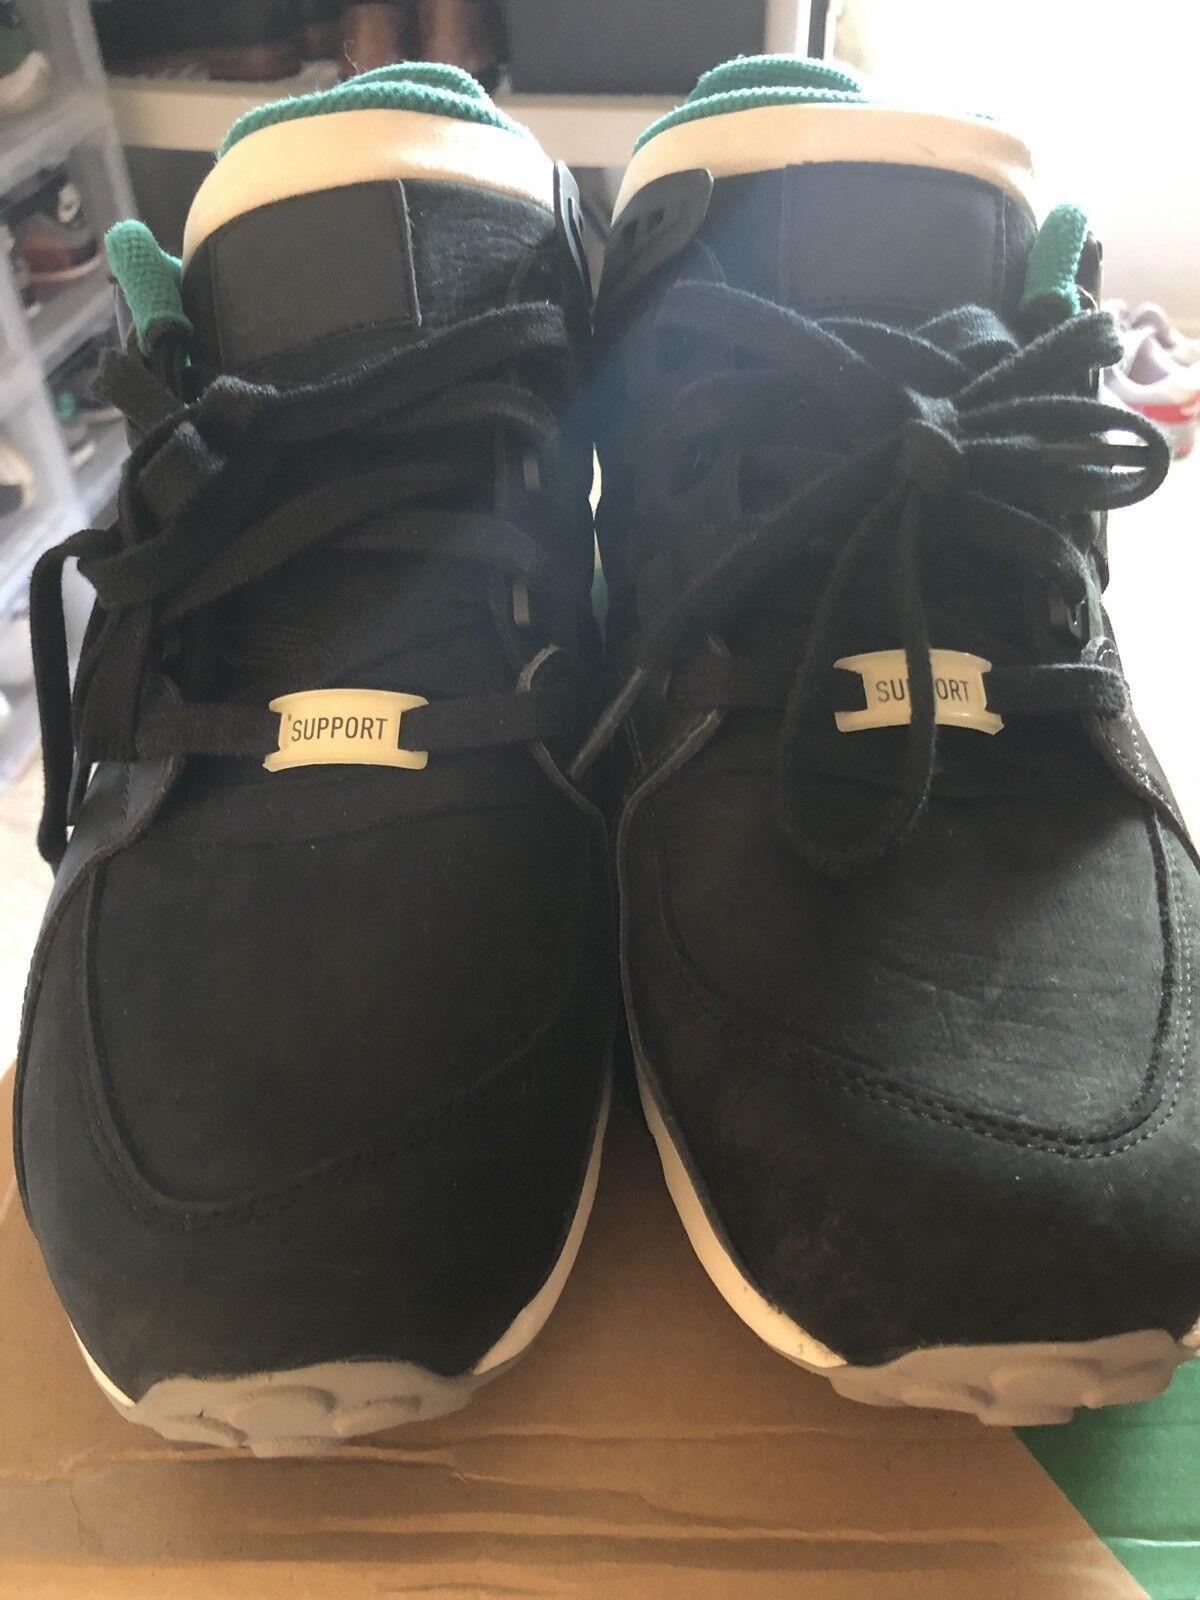 Adidas Originals EQT Running Support 93-C Black Green White White White Size 12.5 5ee37b